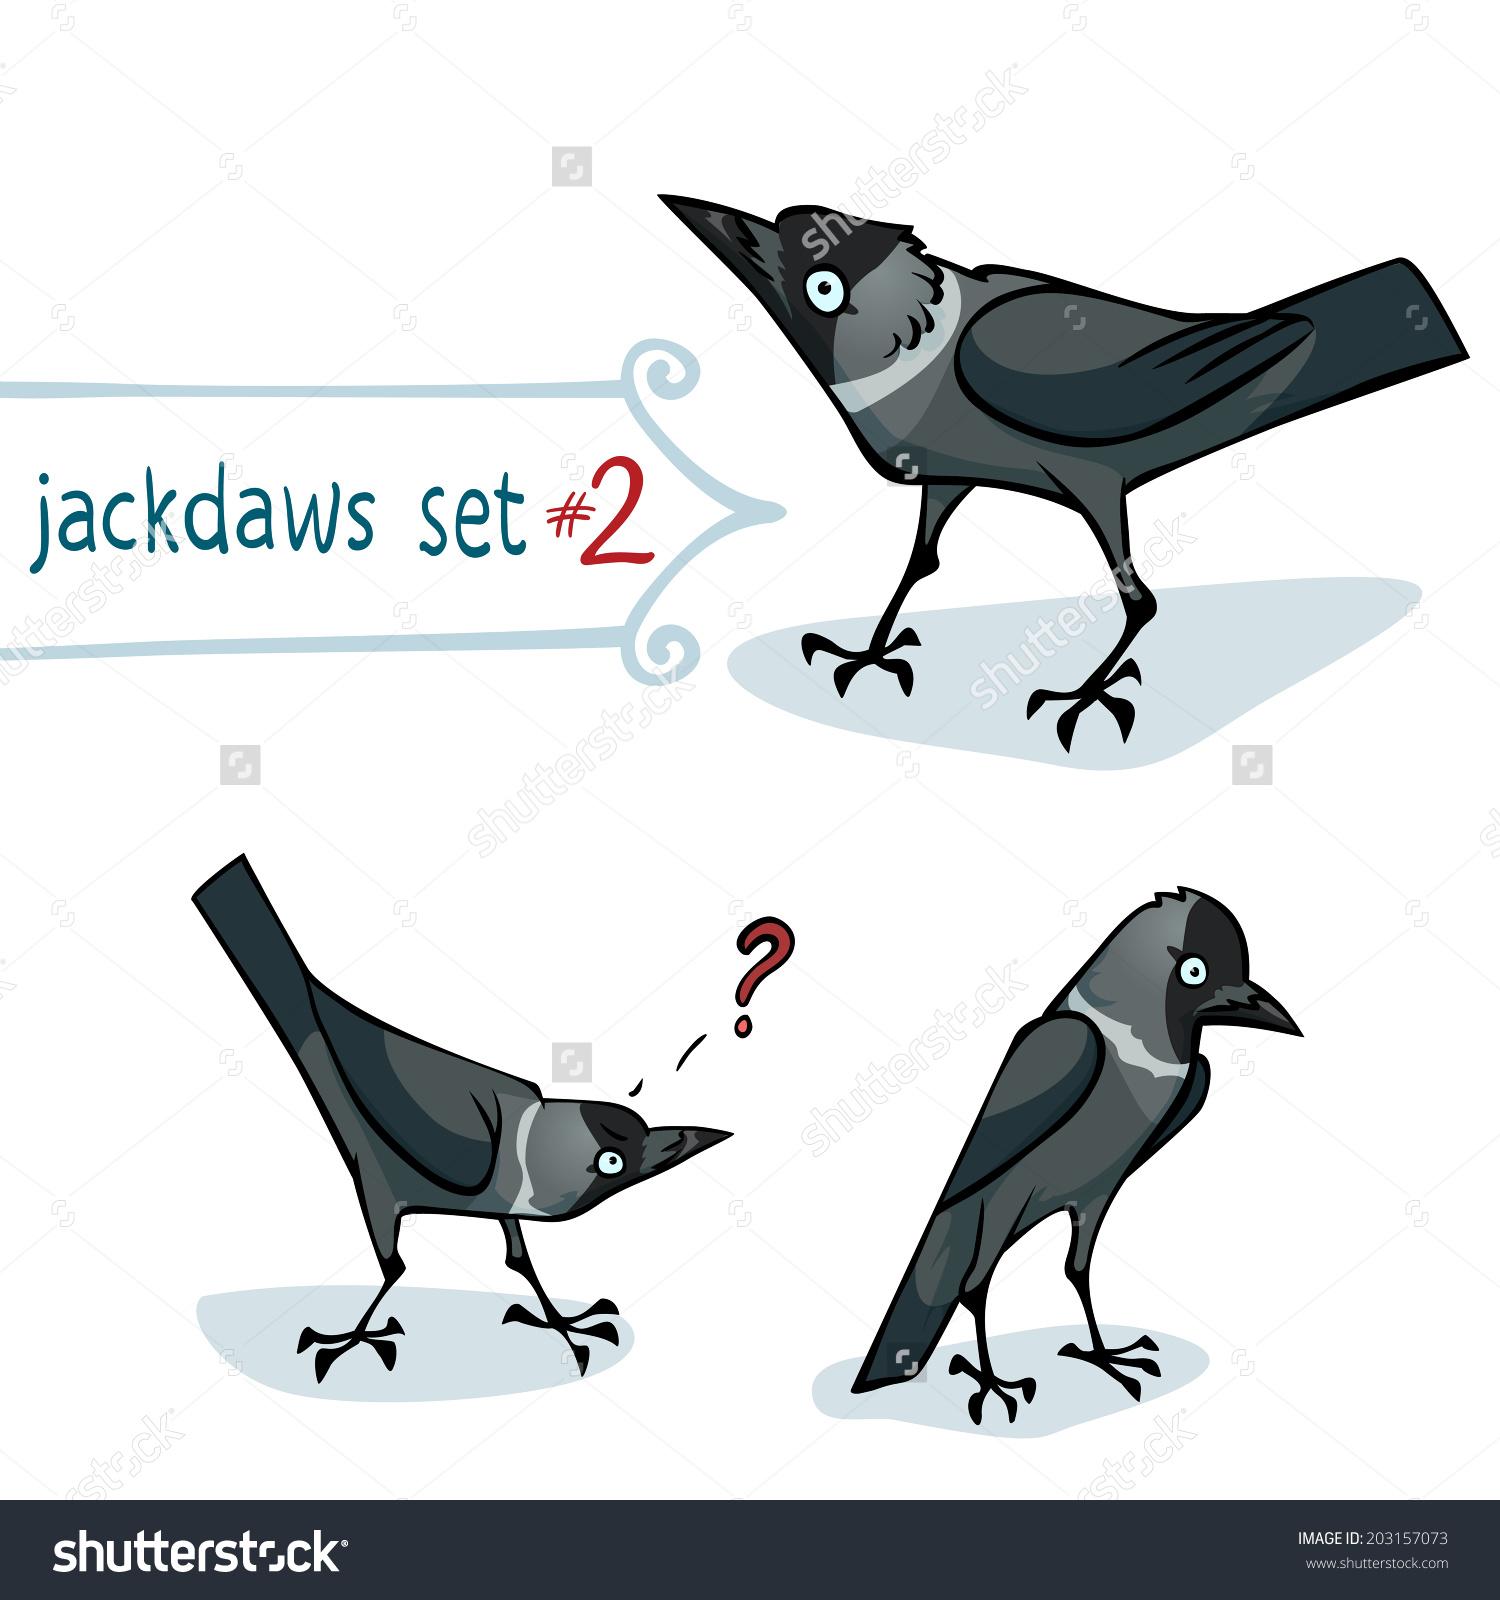 Western Jackdaw clipart #1, Download drawings